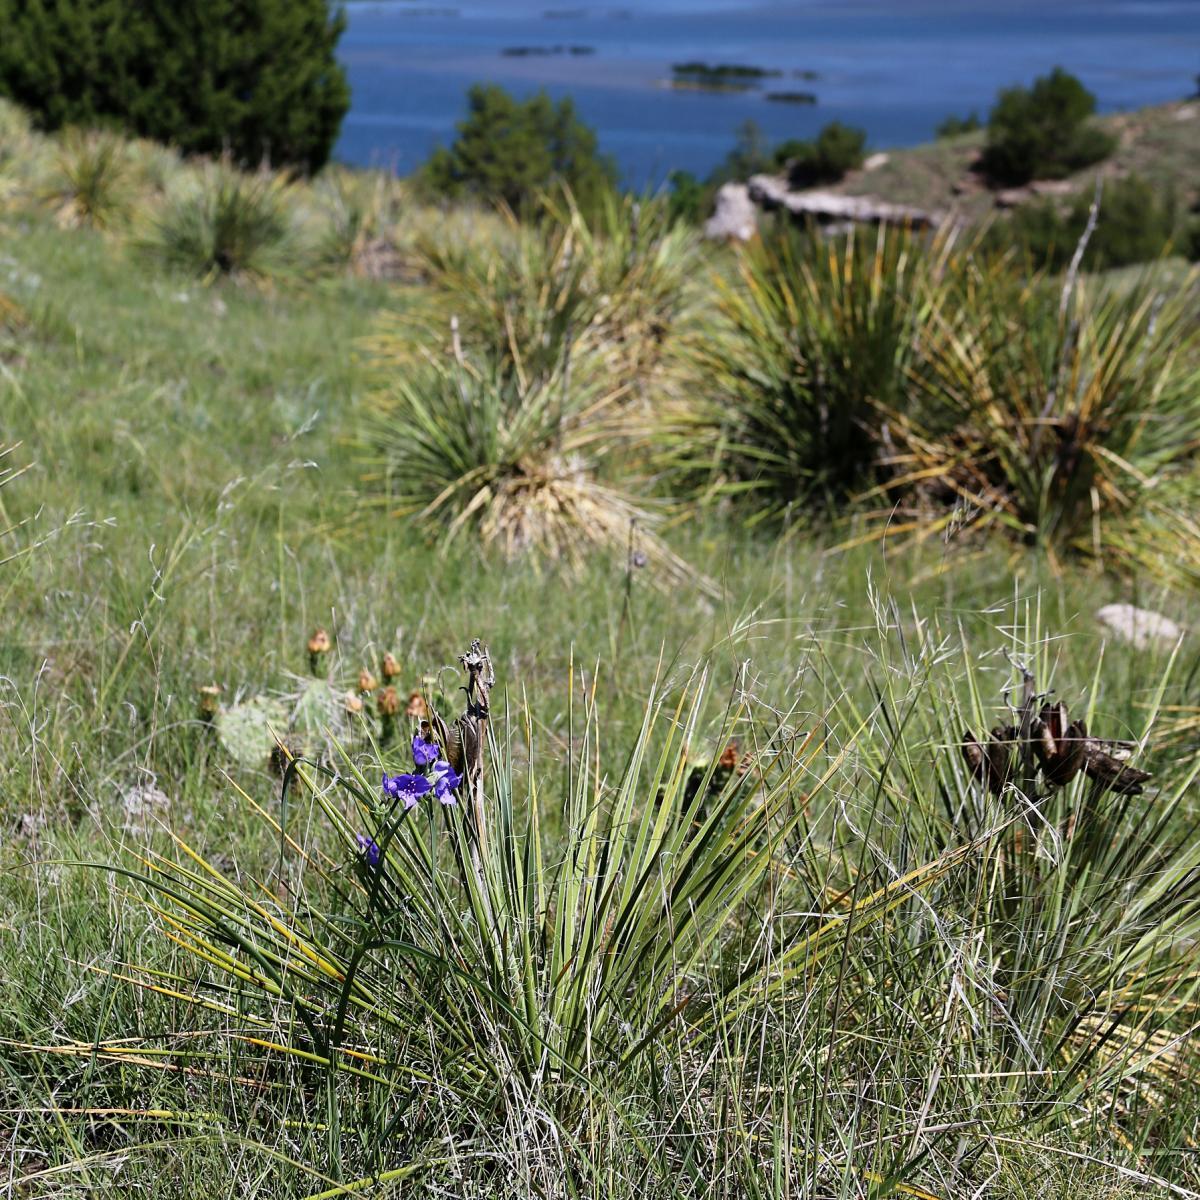 Grassland with yucca